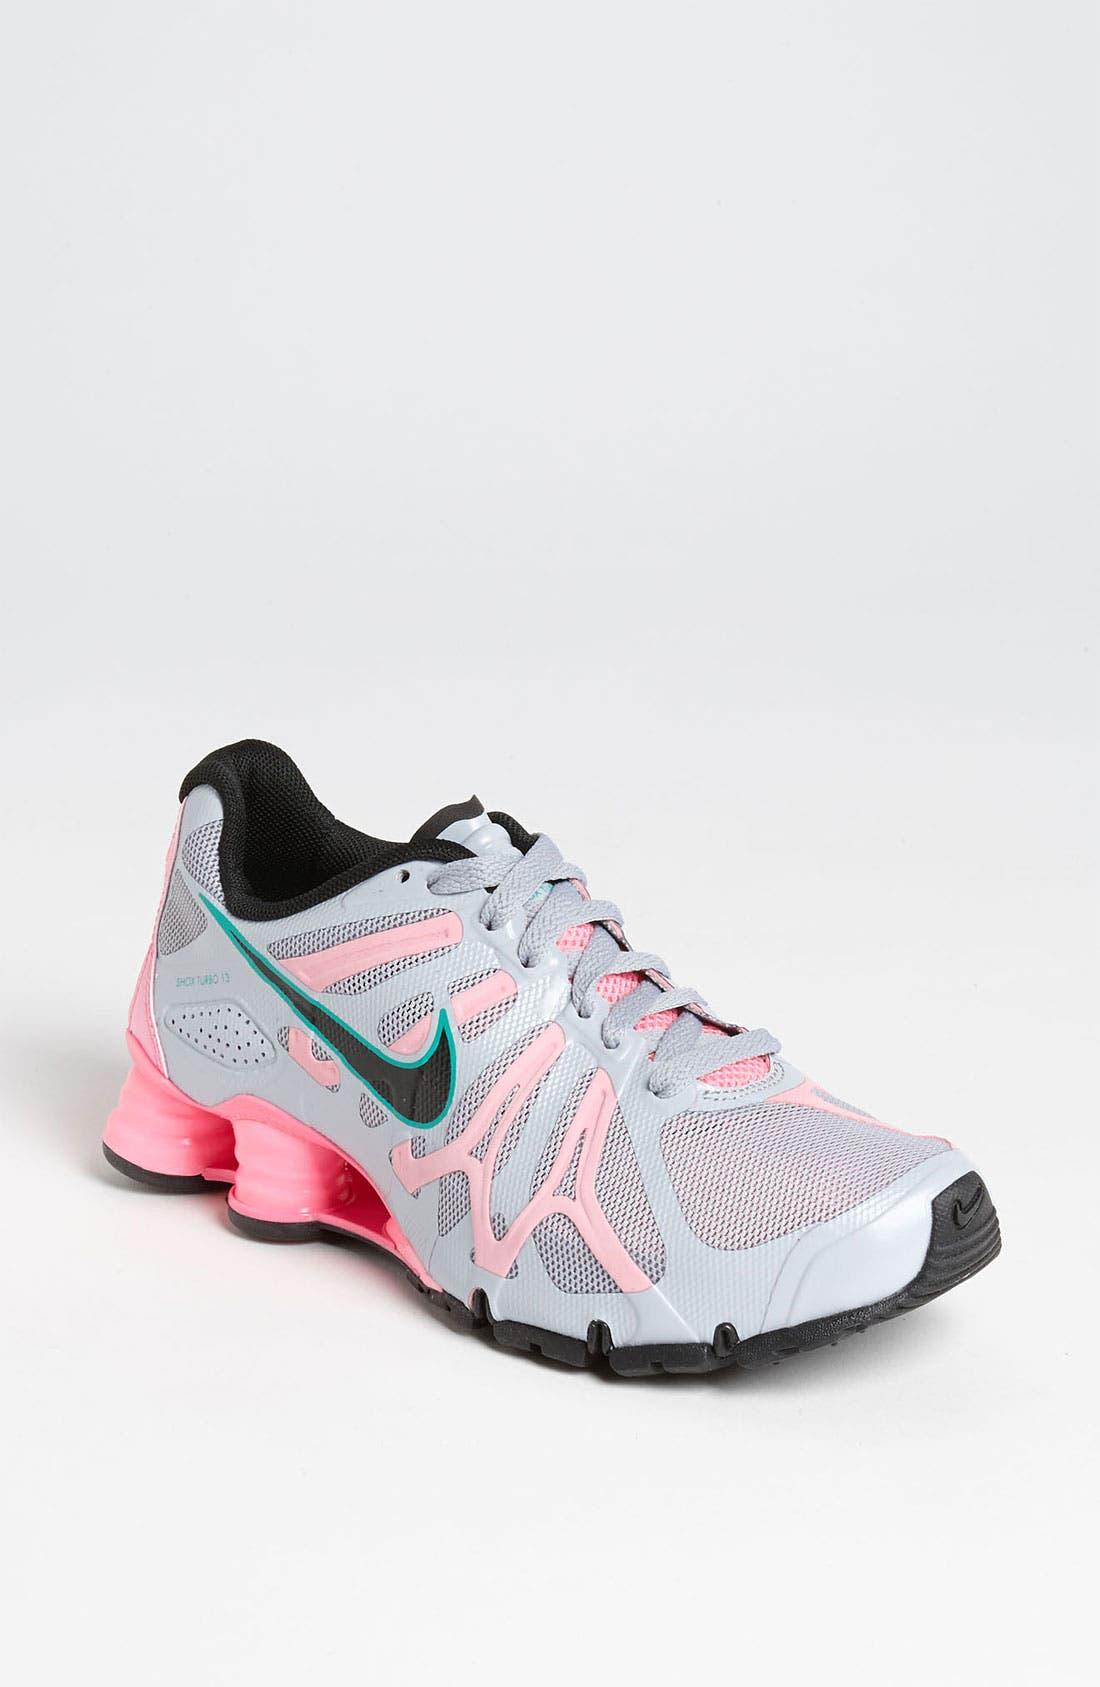 Alternate Image 1 Selected - Nike 'Shox Turbo+ 13' Running Shoe (Women)